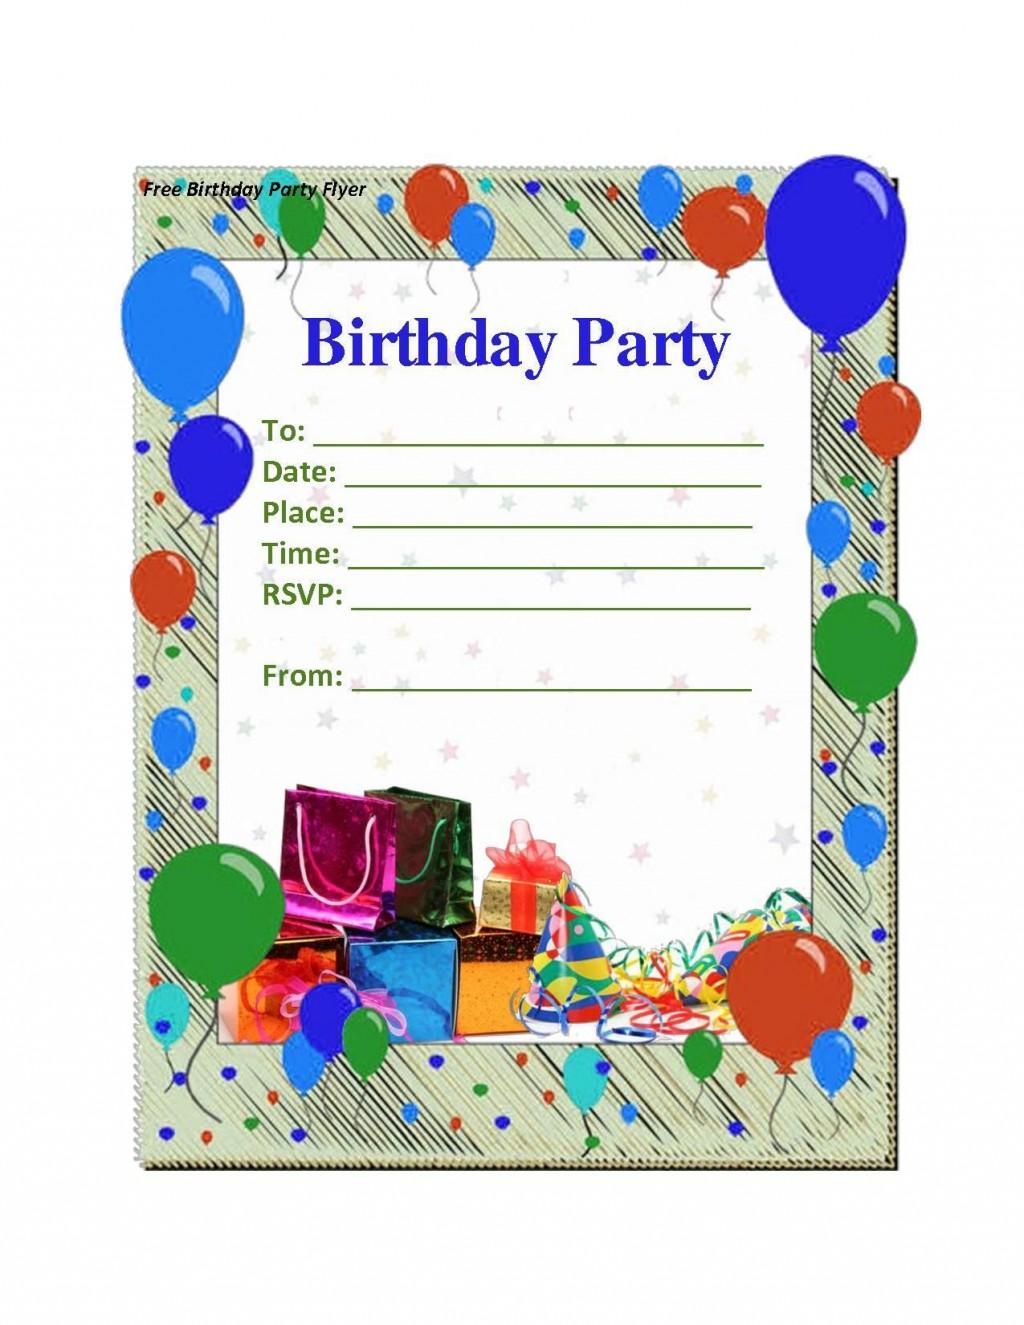 005 Dreaded Free Online Birthday Invitation Maker Printable Highest Clarity  1st CardLarge